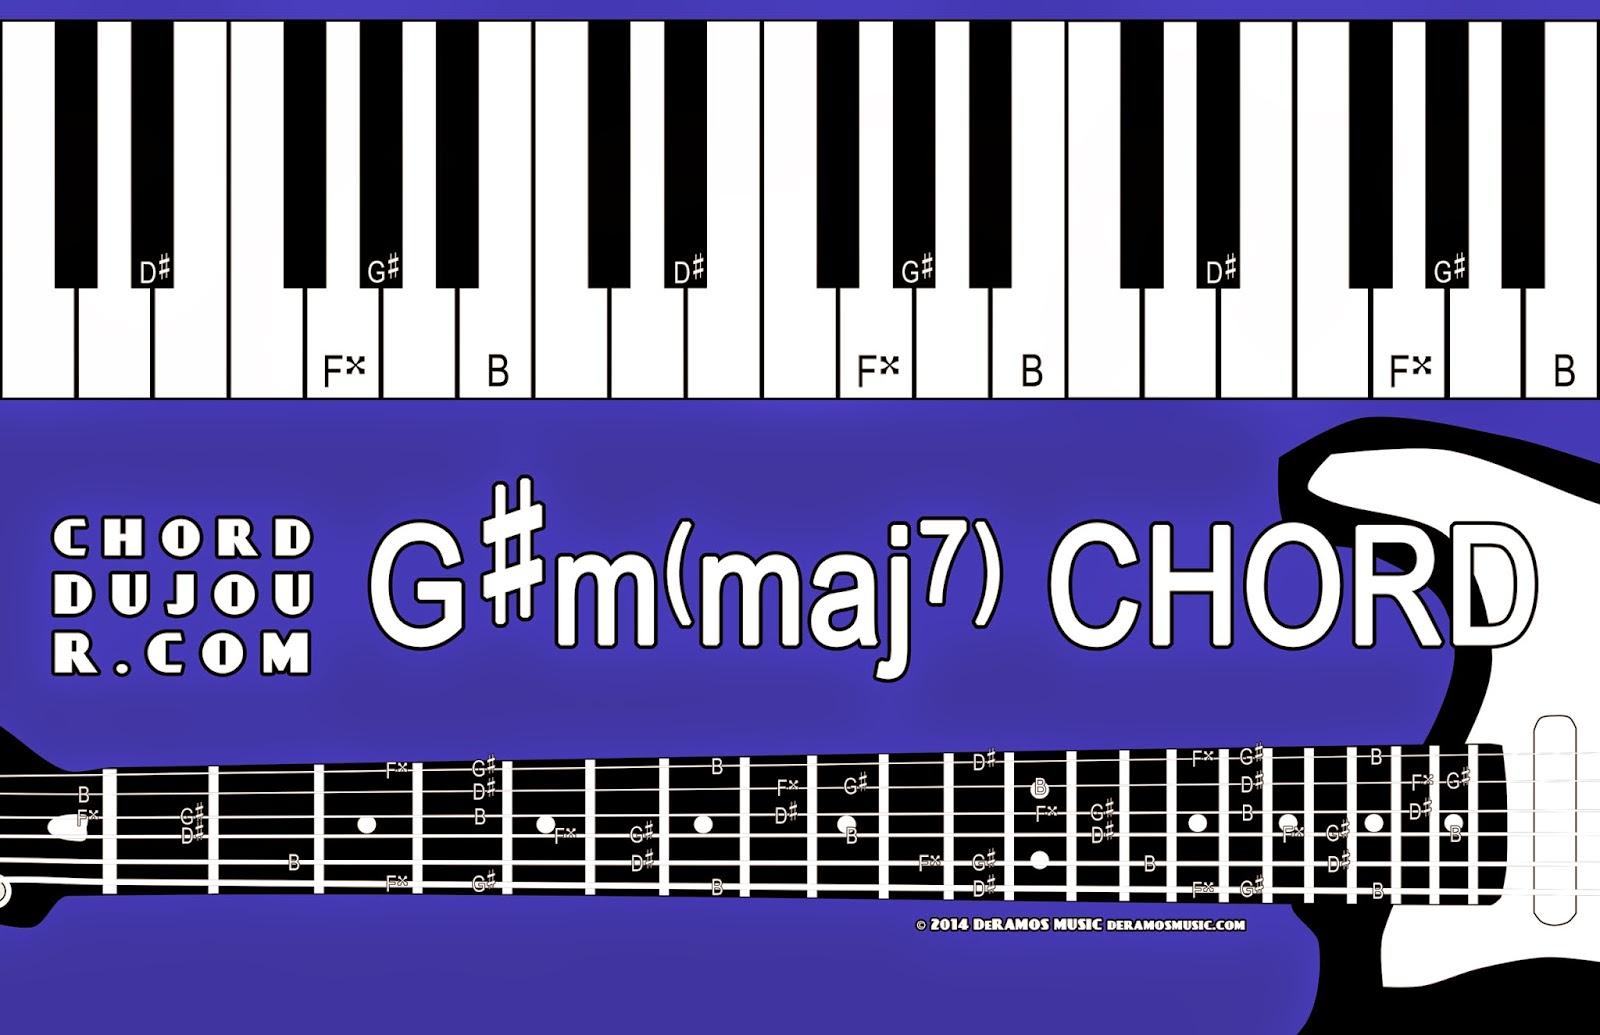 Chord Du Jour Dictionary Gmmaj7 Chord